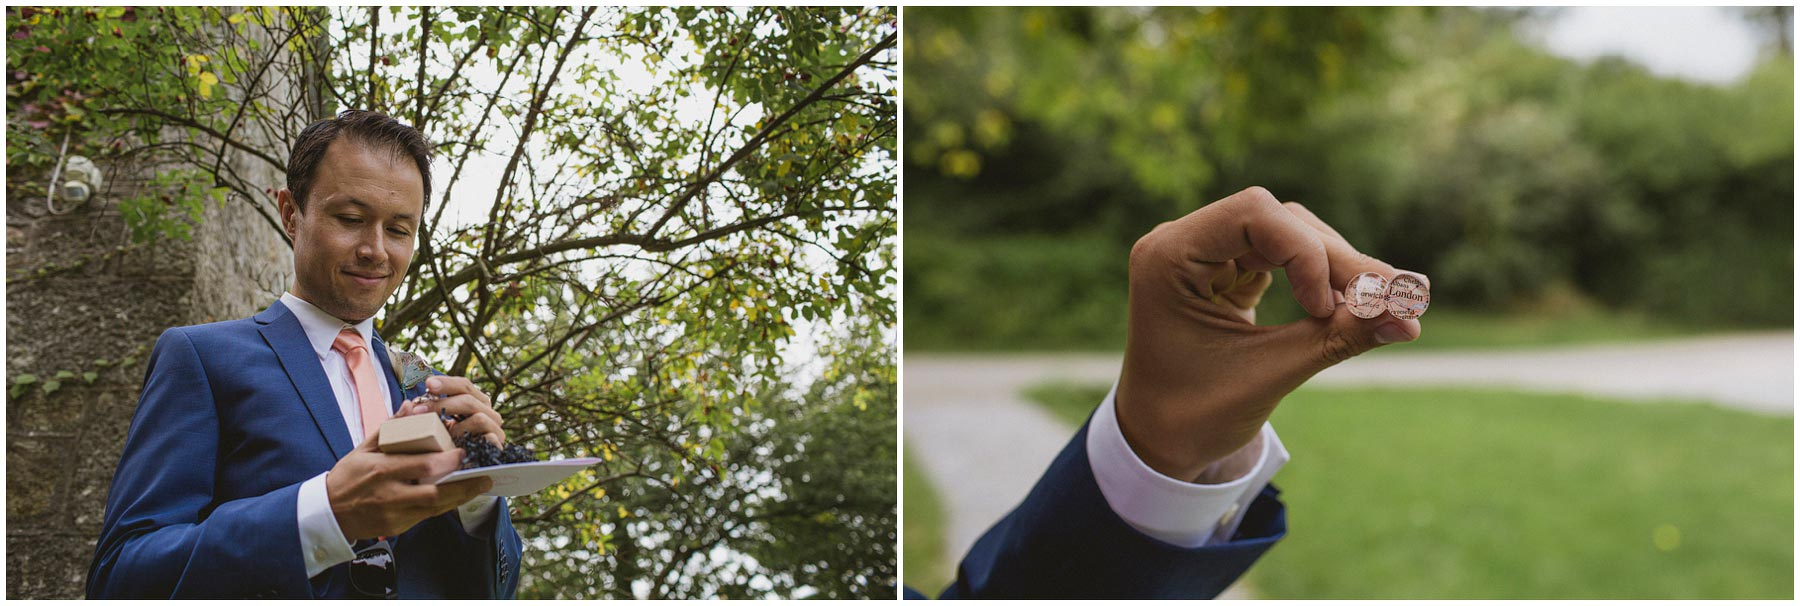 Colehayes-Park-Wedding-Photography_0032